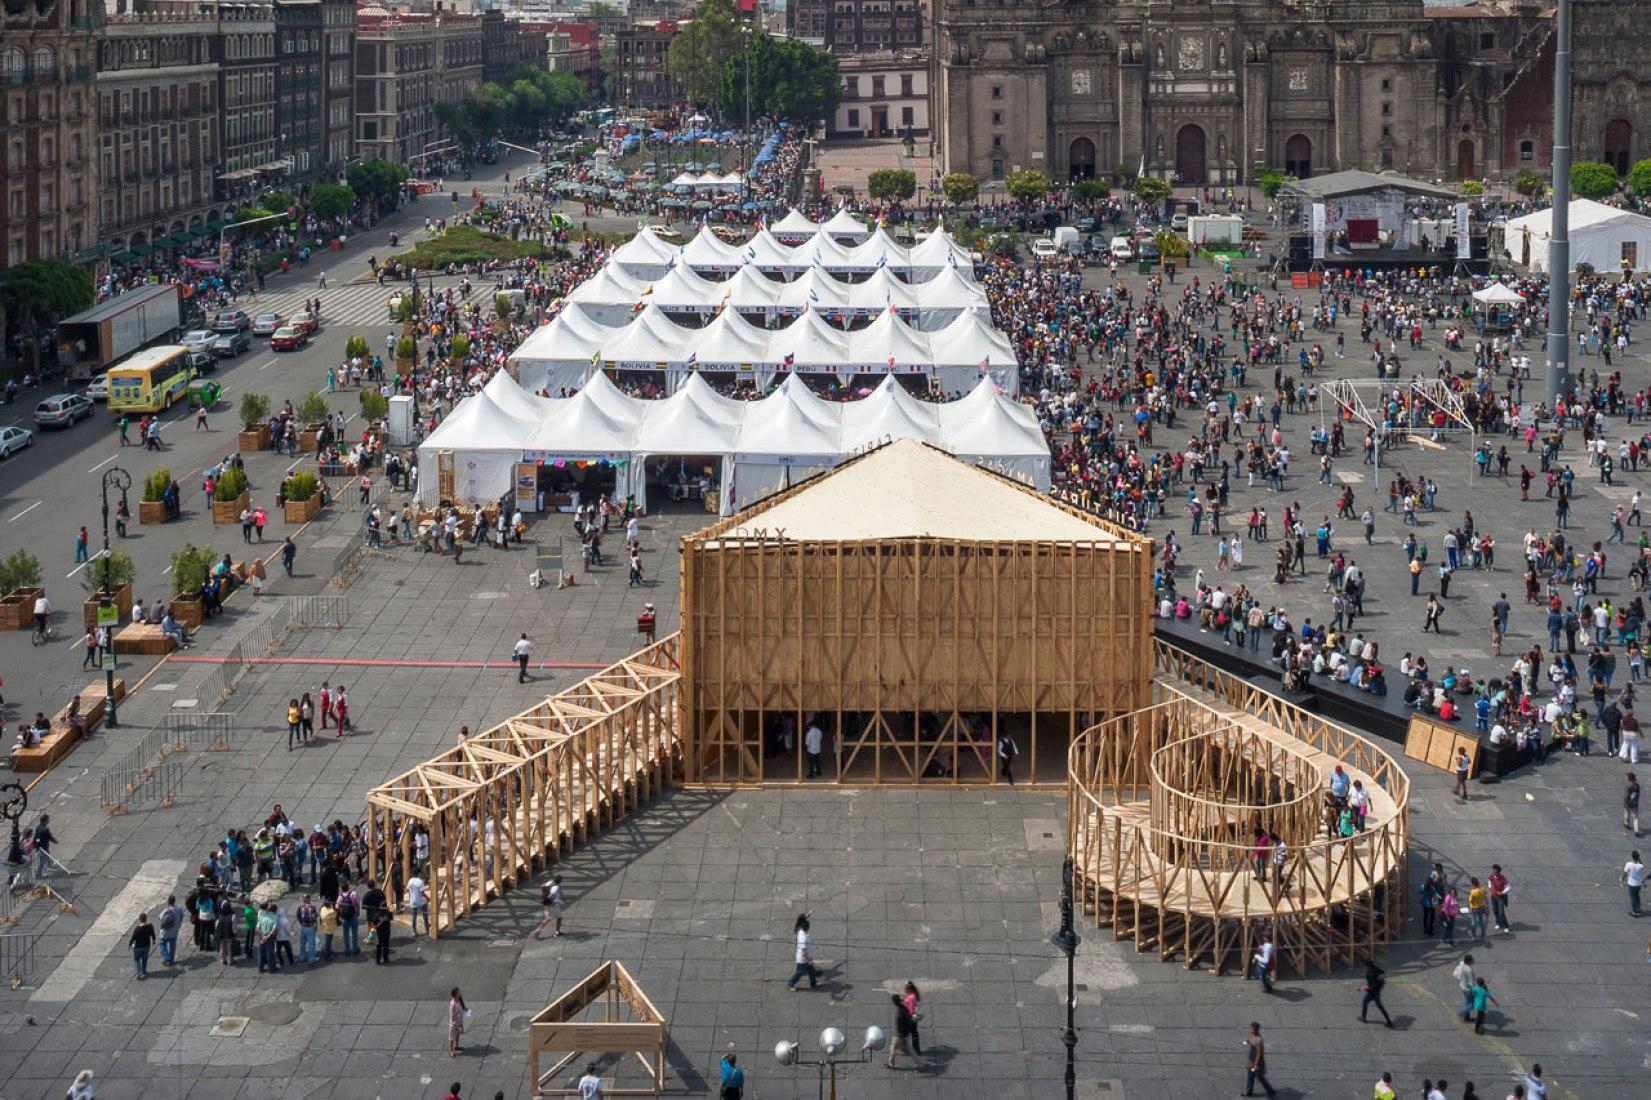 MCHAP.emerge 2014/15 Winner. Mexico Pavilion for the Feria de las Culturas 2014 by Productora. Photography © Luis Gallardo